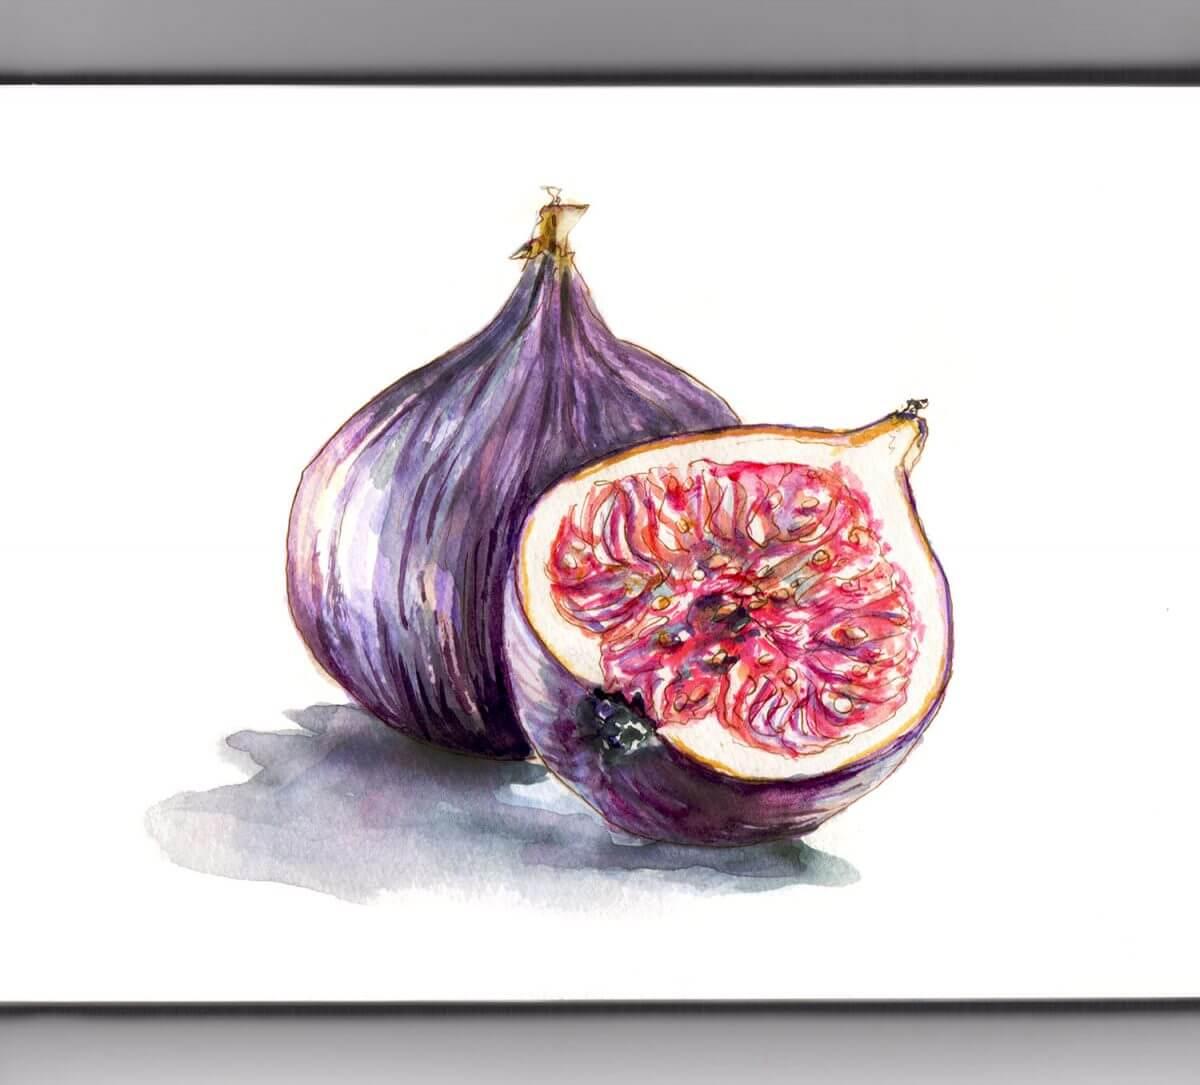 #WorldWatercolorGroup - Day 1 - Cornucopia - Figs - Doodlewash